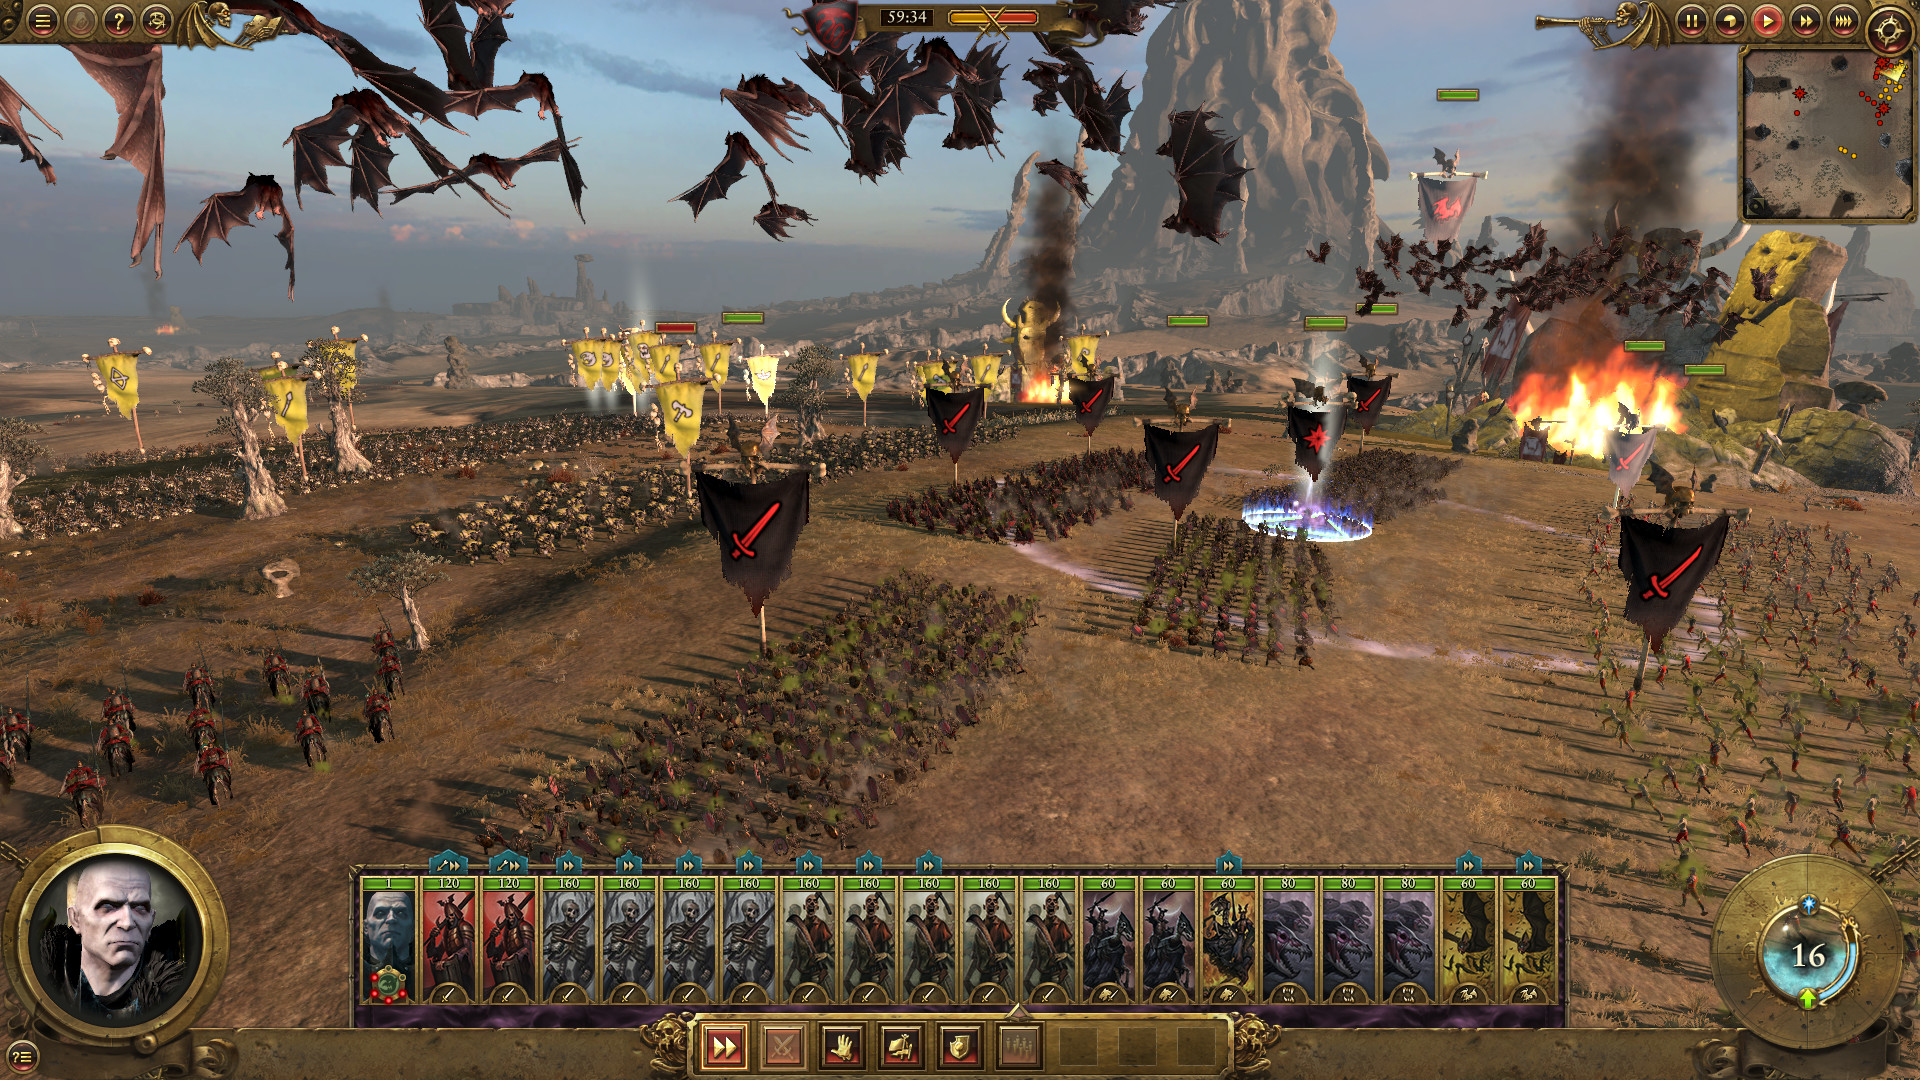 Total War: Warhammer Screenshot 3